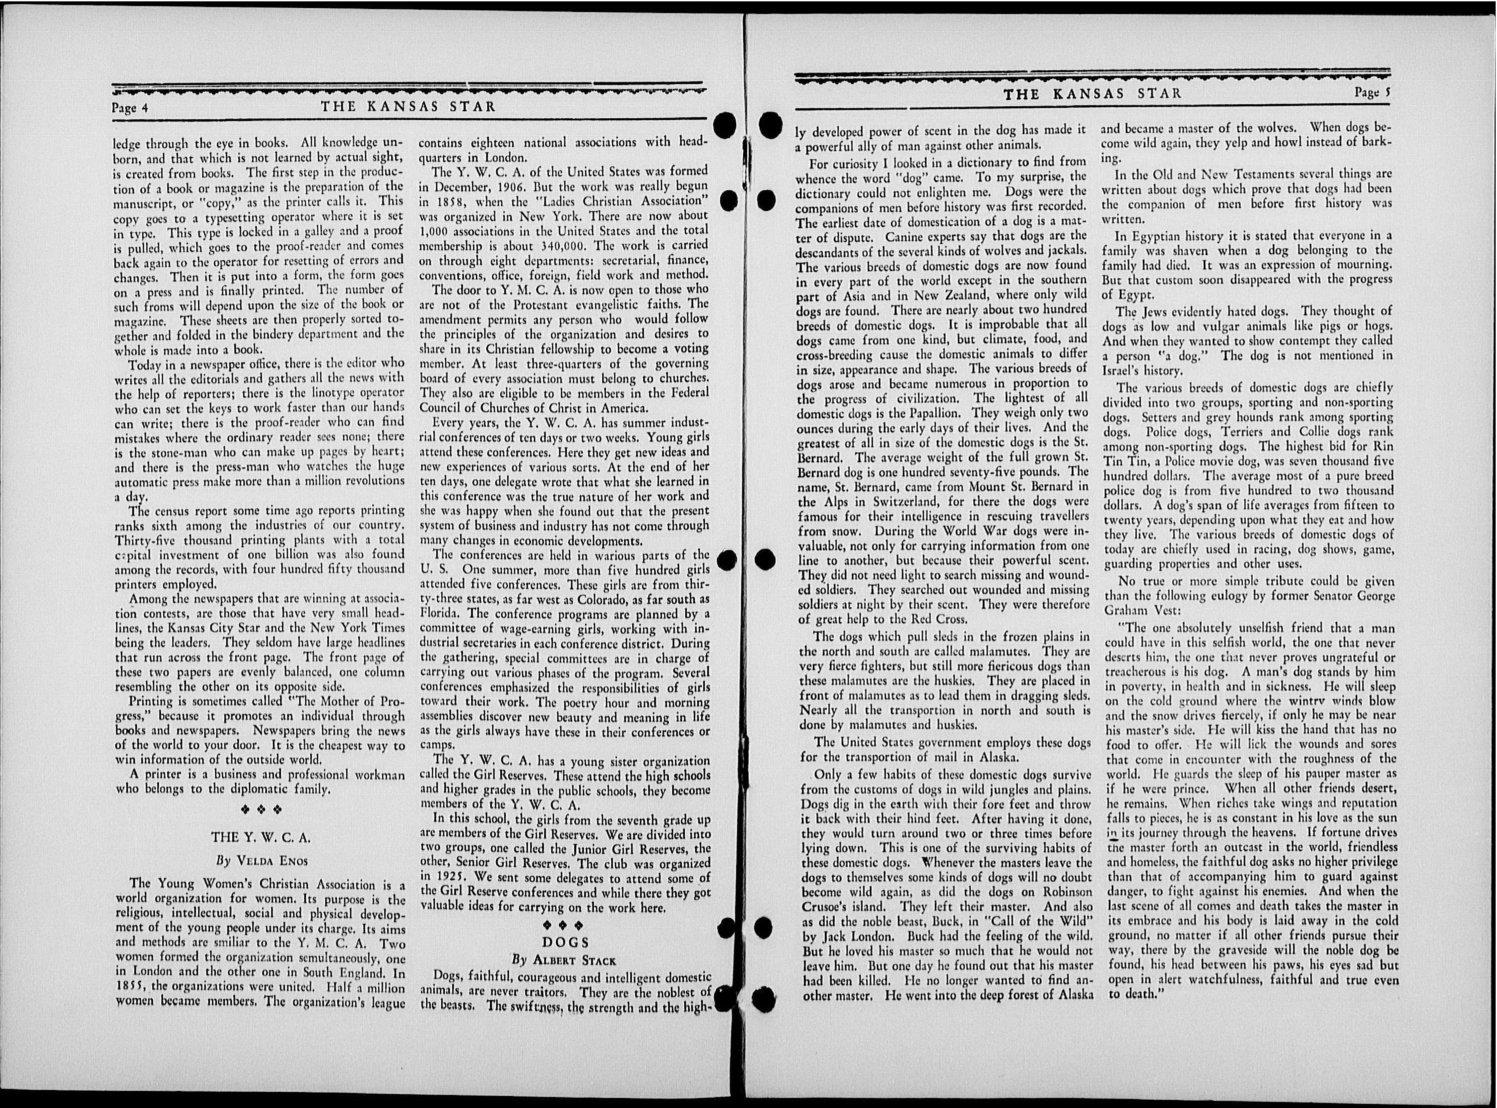 The Kansas Star, volume 53, number 9 - 4-5